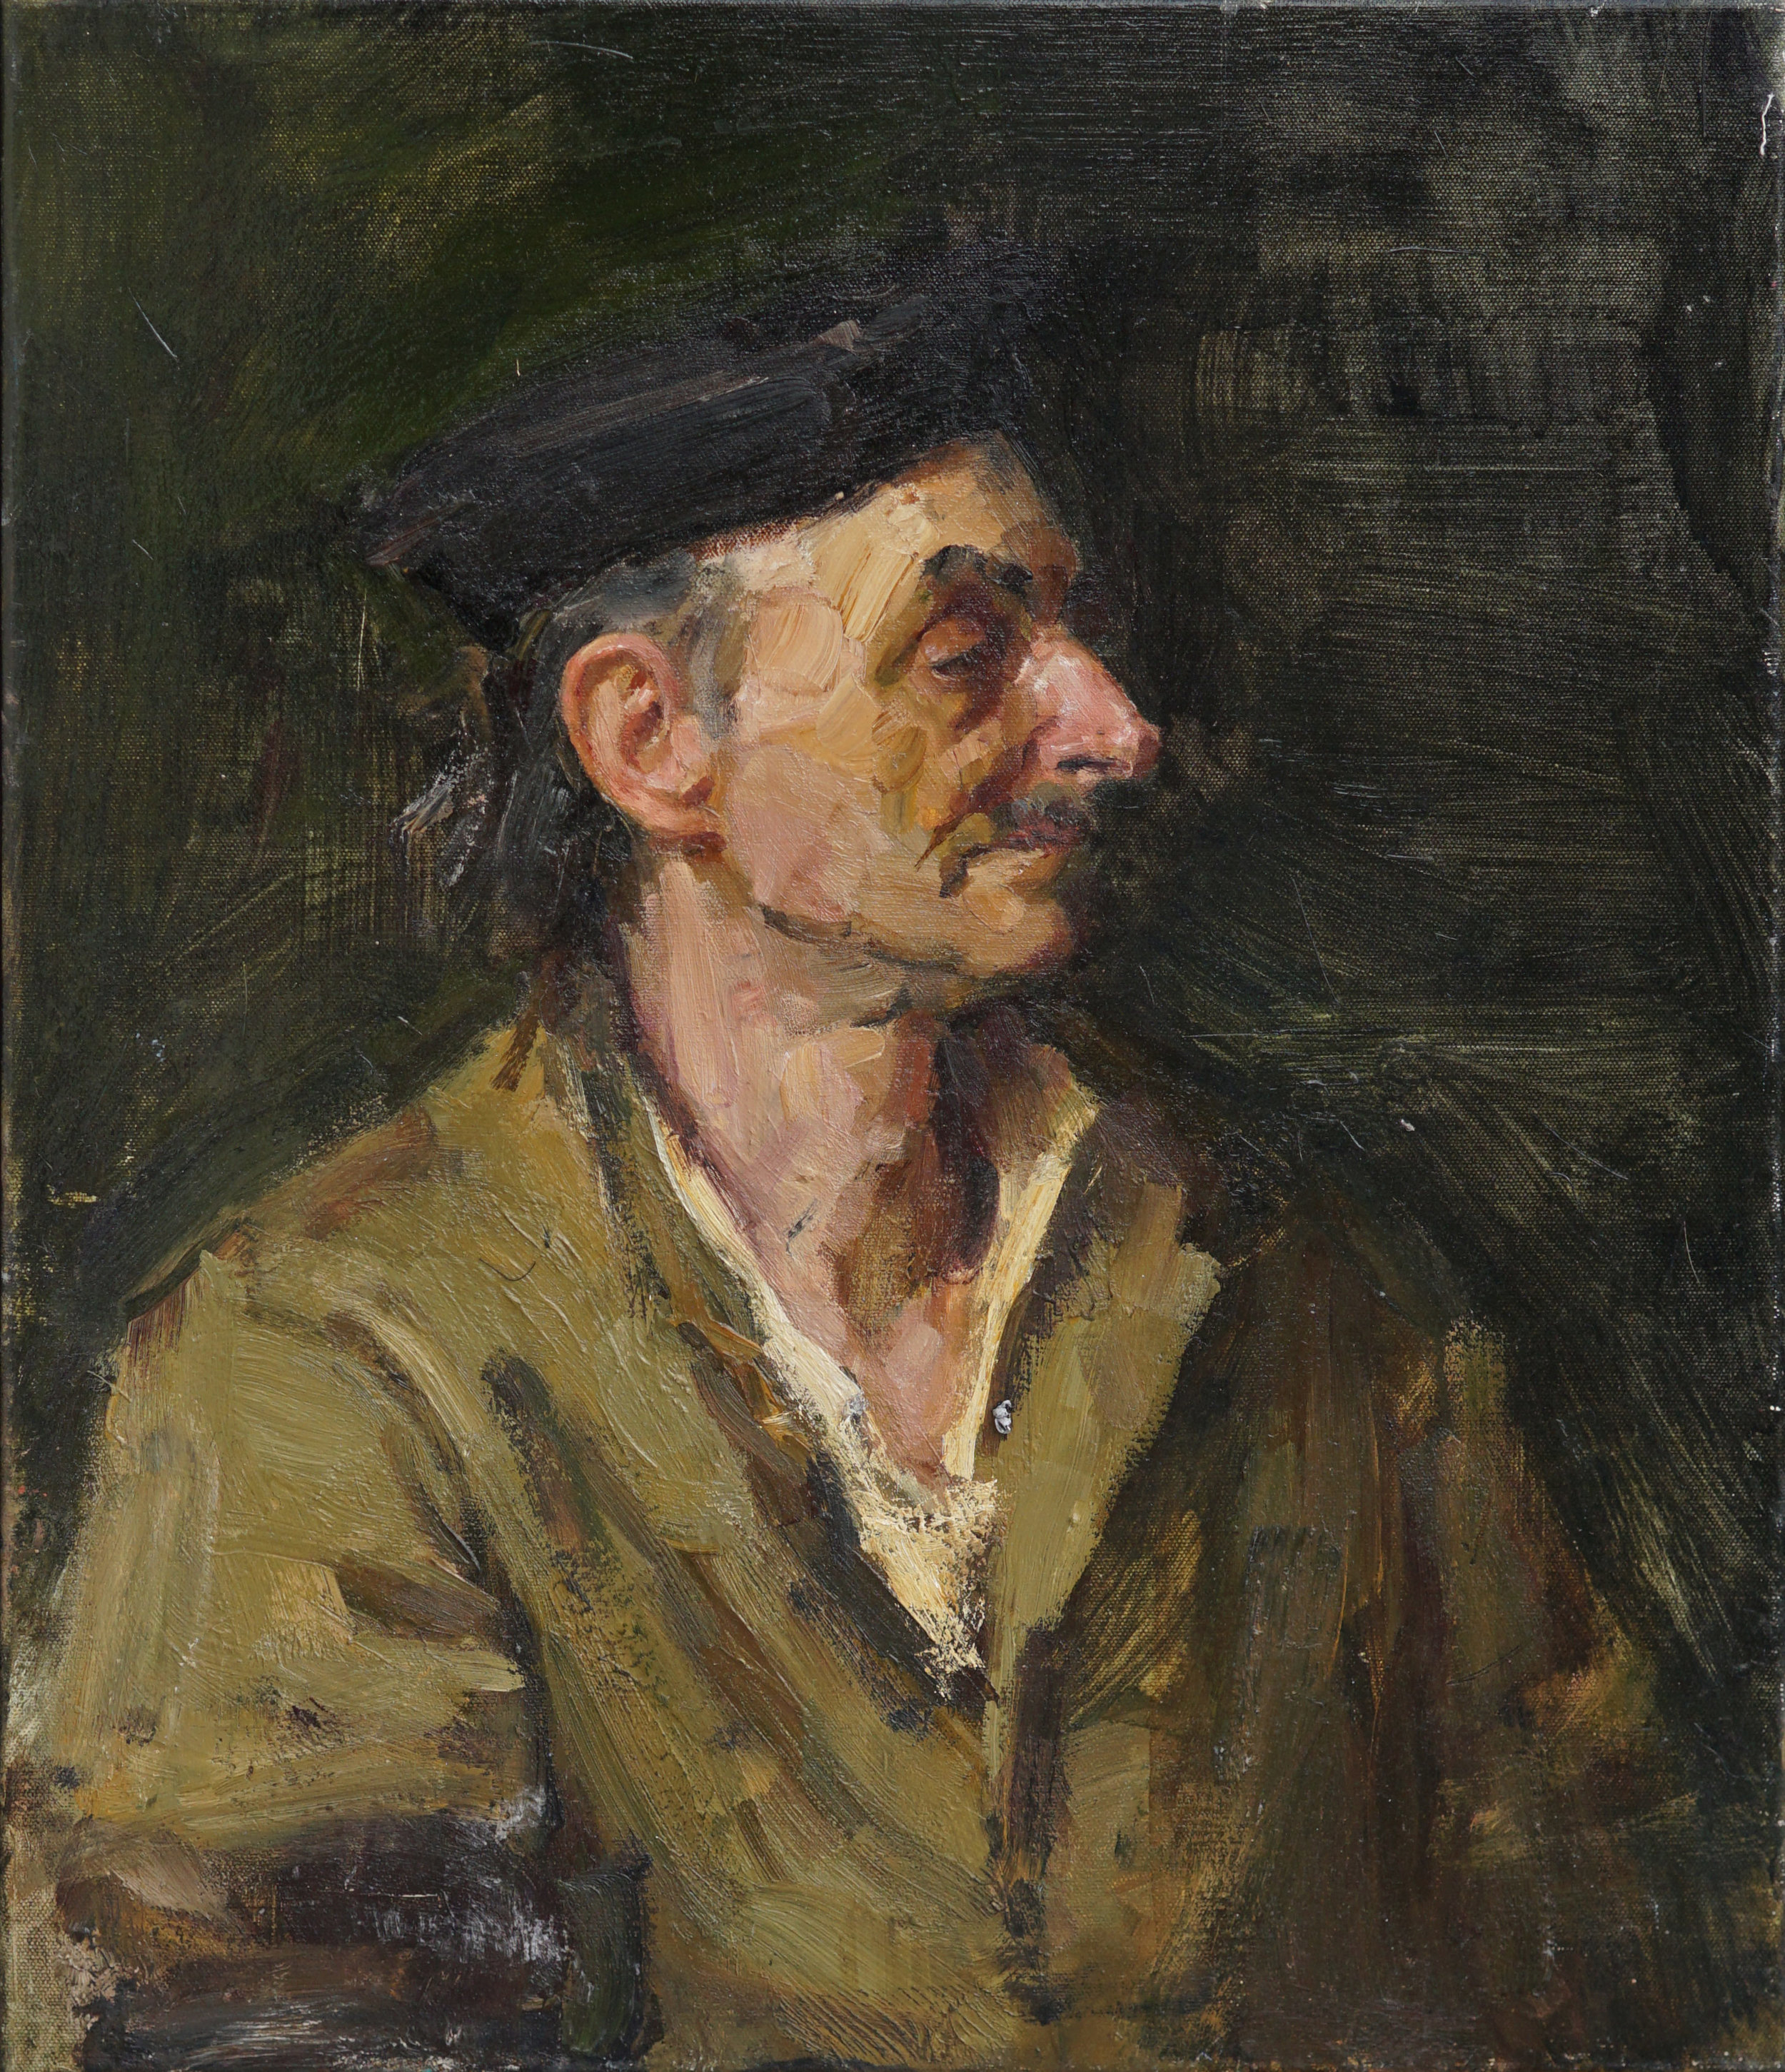 Portrait of an old man,  23 2 3 x 19 3 4, Oil,Linen.jpg